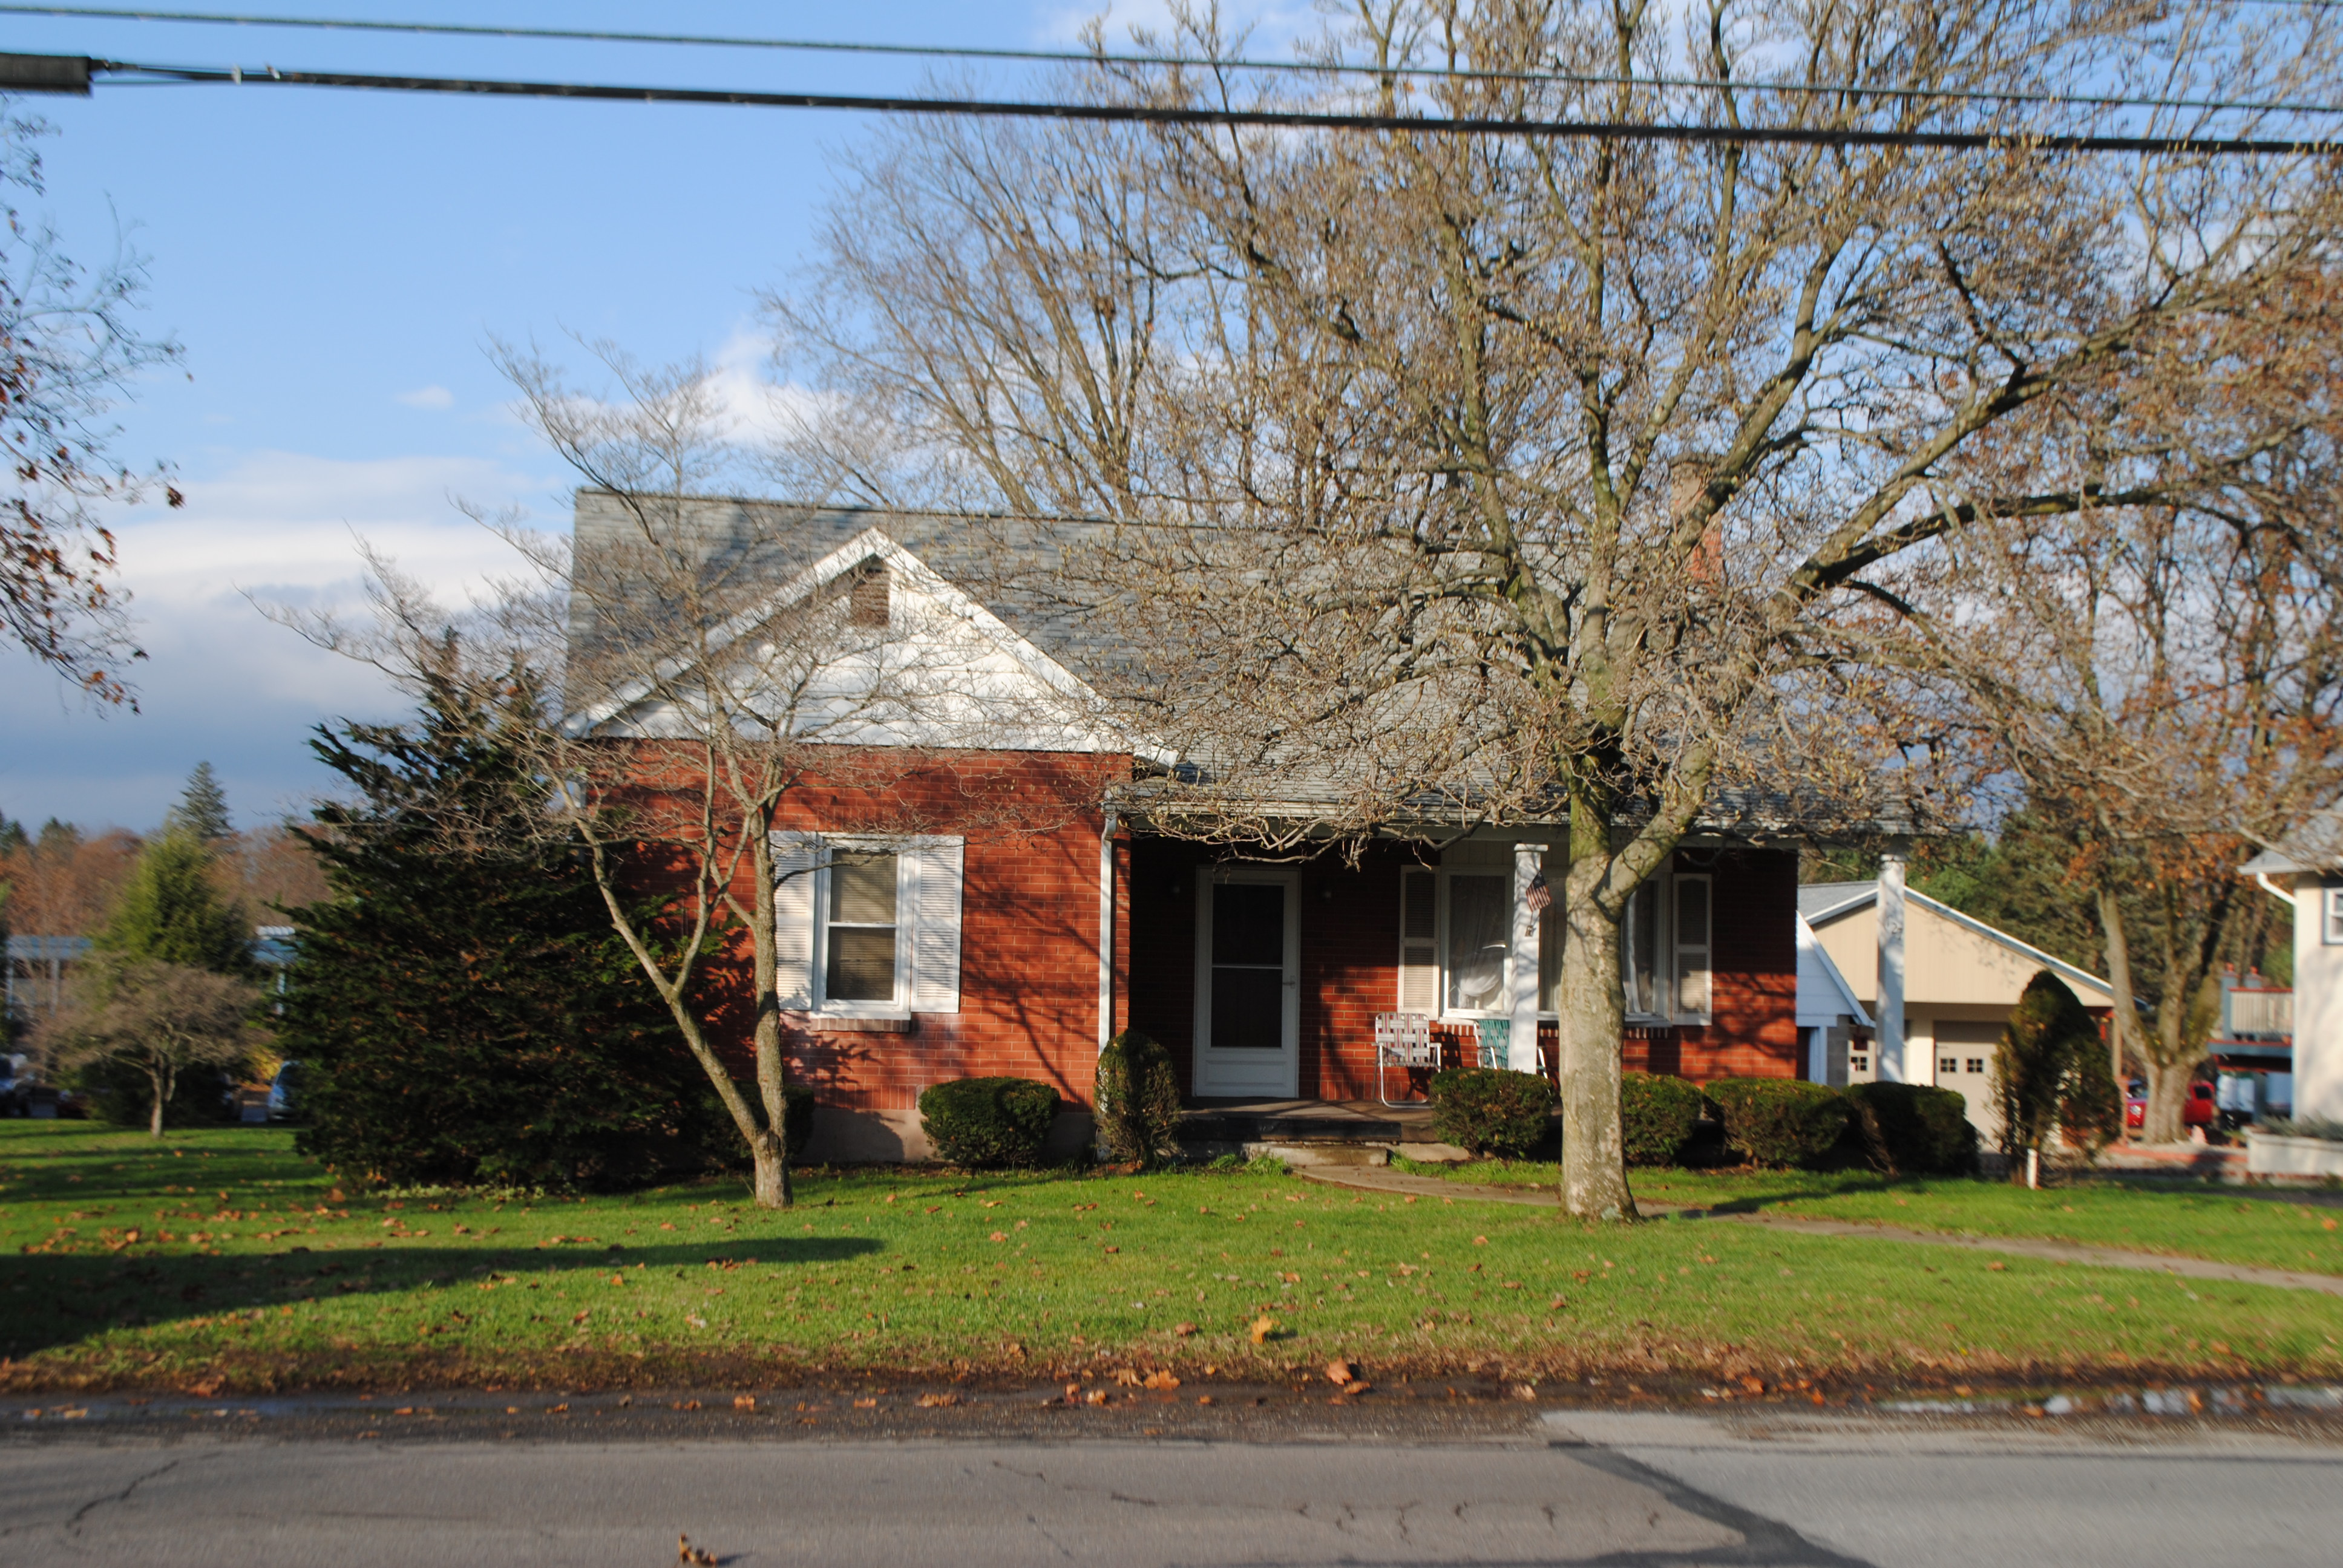 127 New Street, Muncy, Pennsylvania 17756